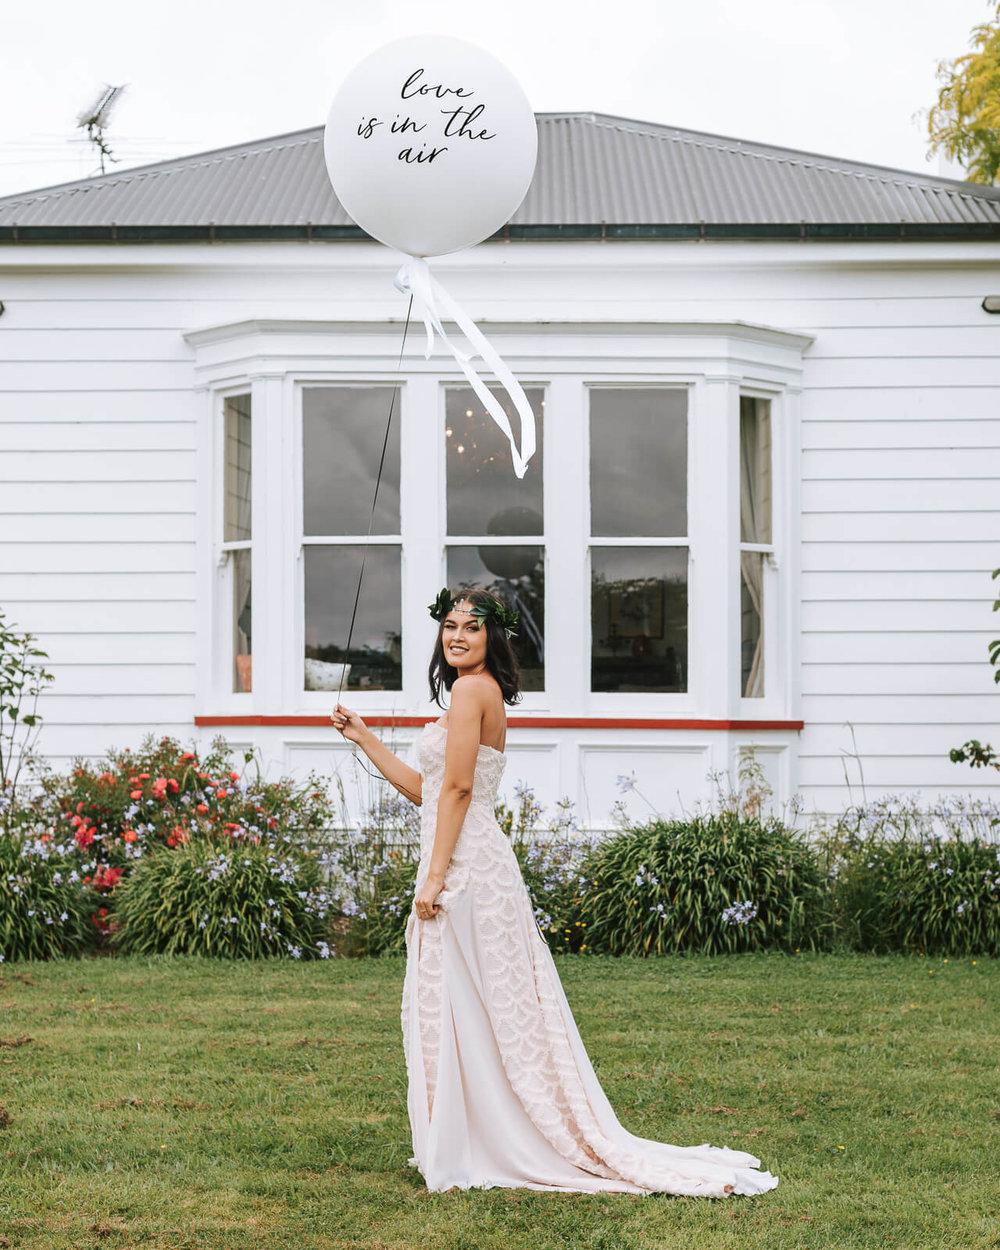 elizabeth may bridal DSC_1491_EmmaSkye.jpg